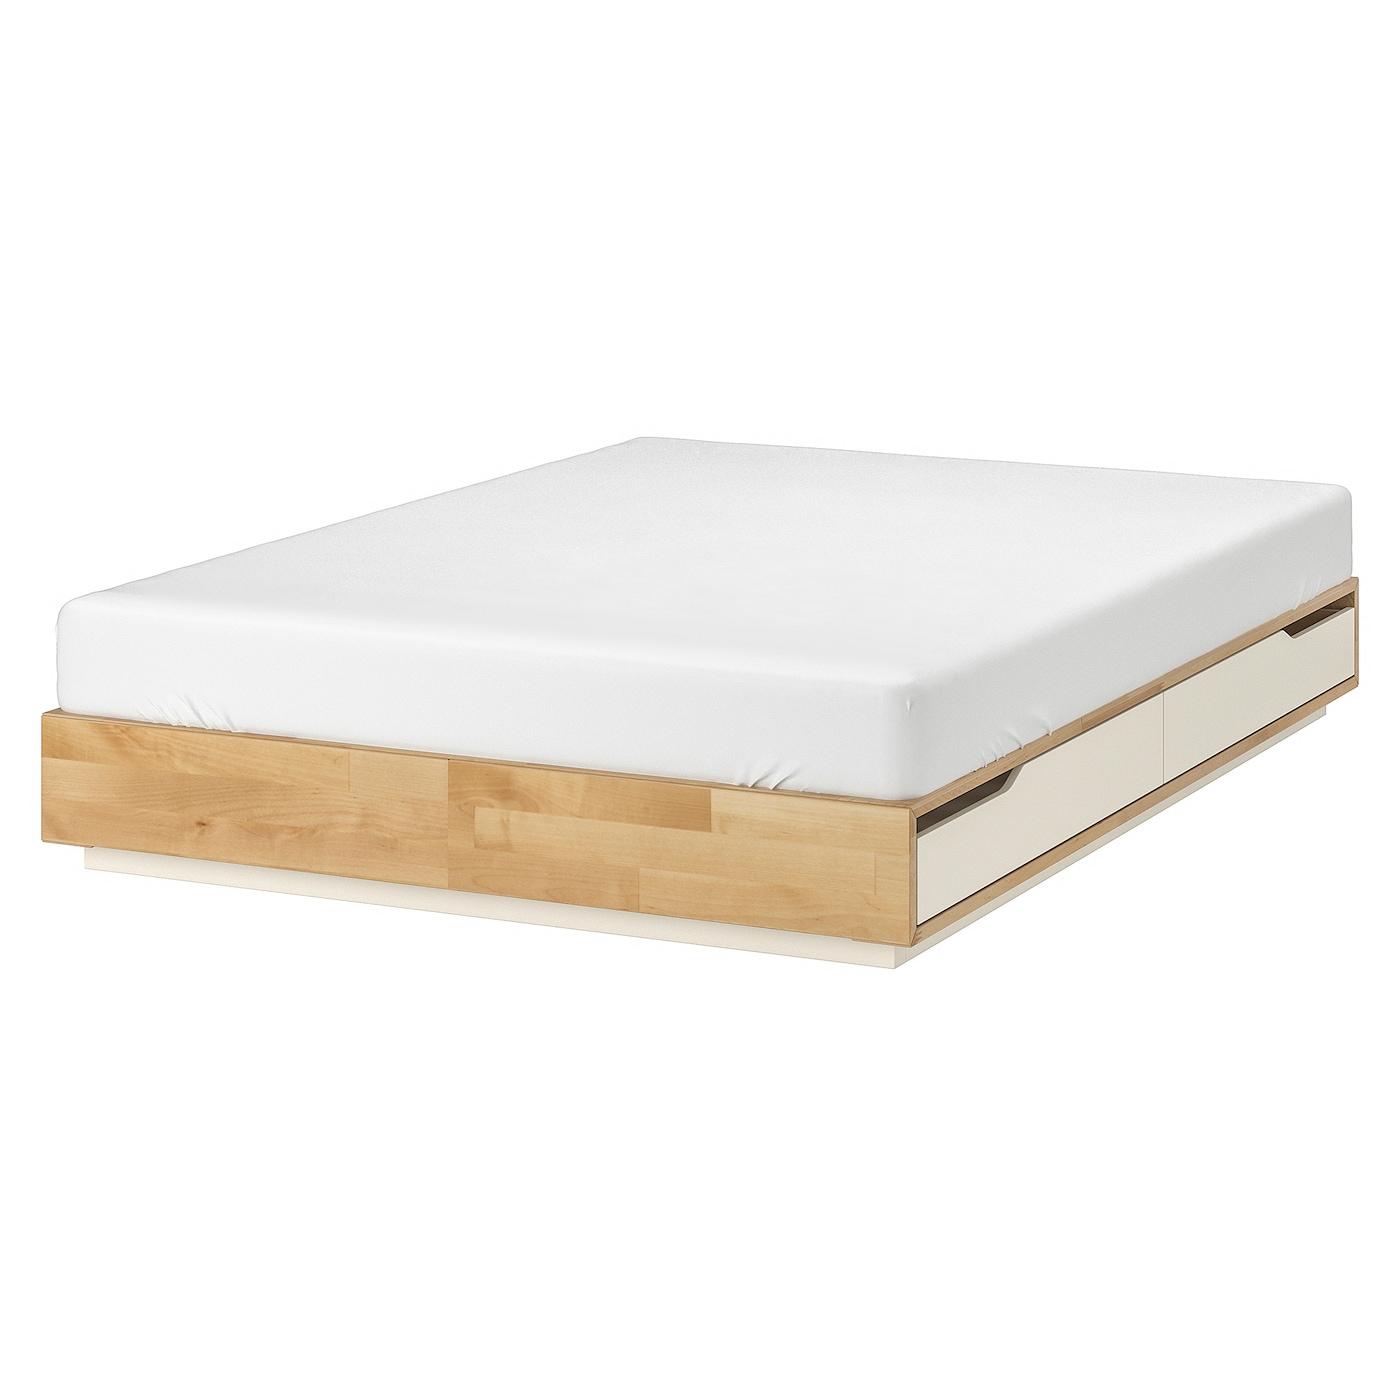 MANDAL Bed frame with storage - birch/white 10x10 cm